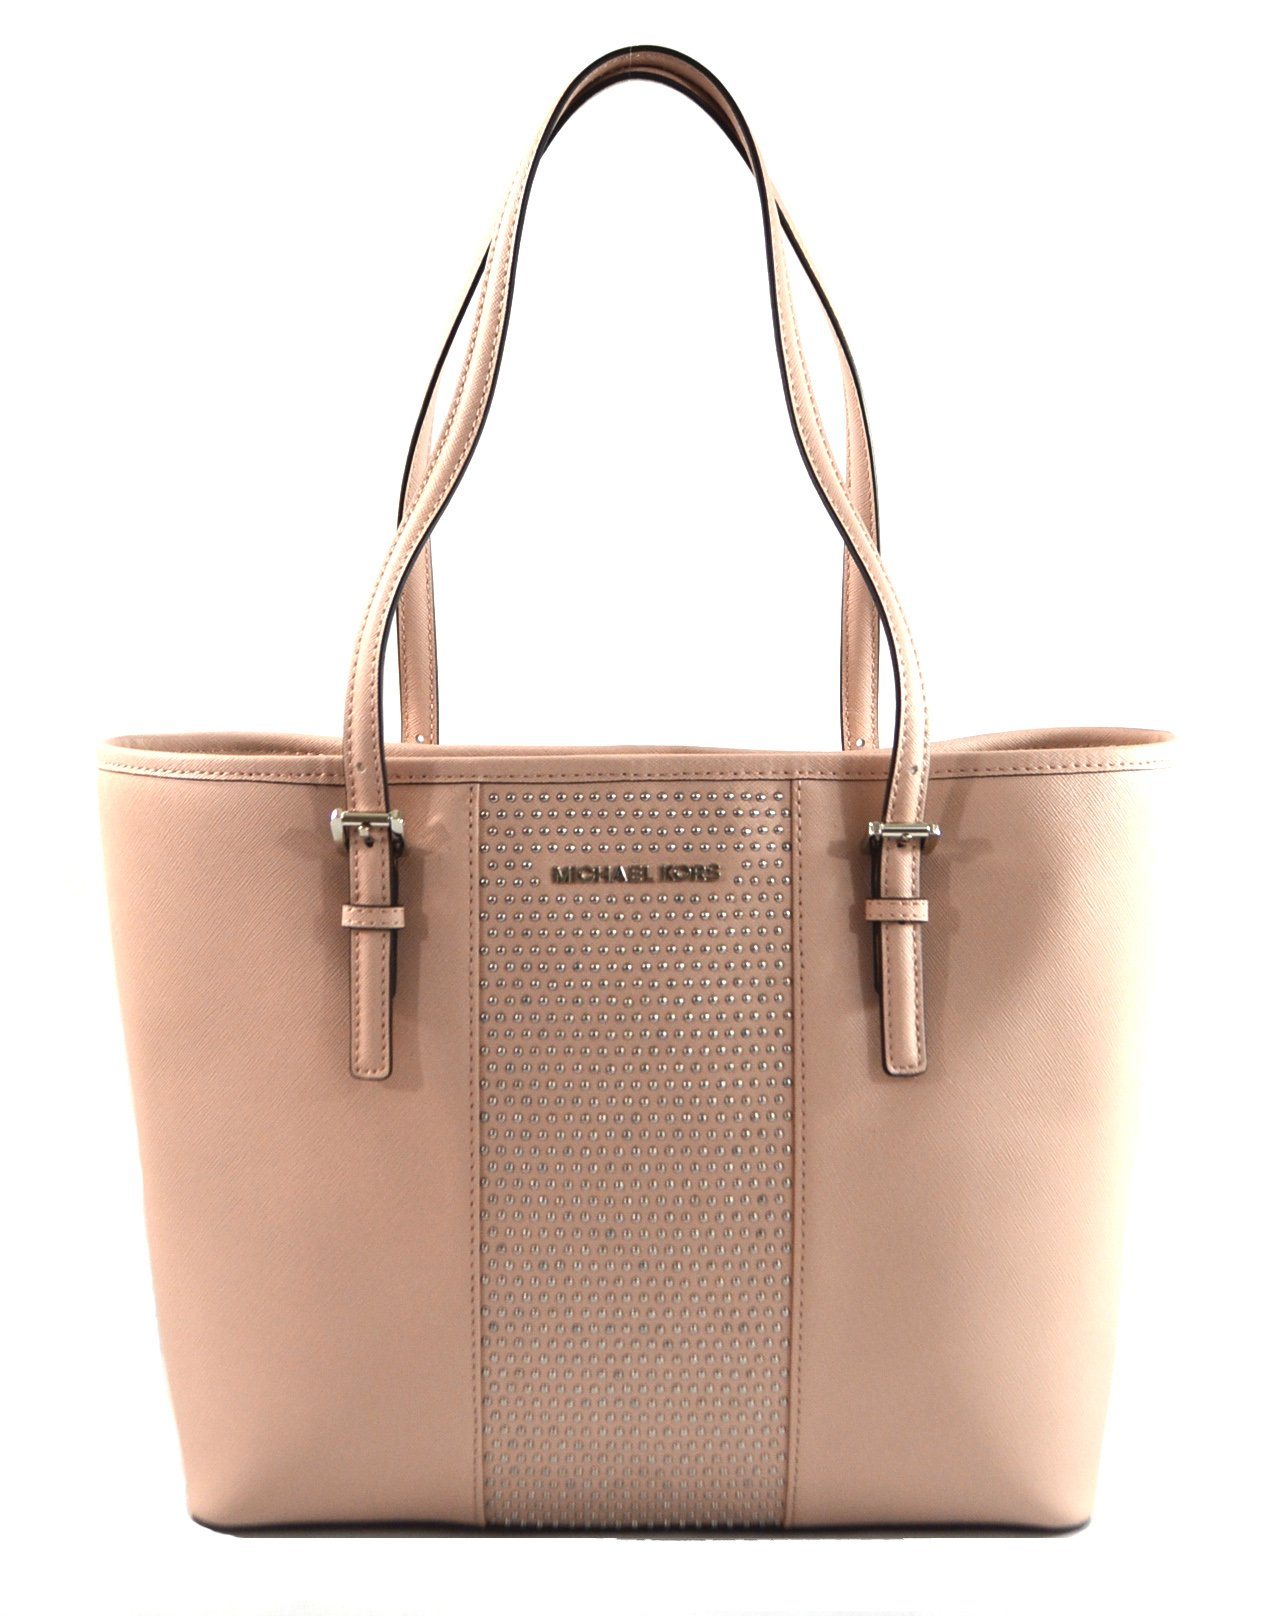 Michael Kors Women's Jet Set Travel Micro Stud Leather Carry All Tote Handbag Ballet